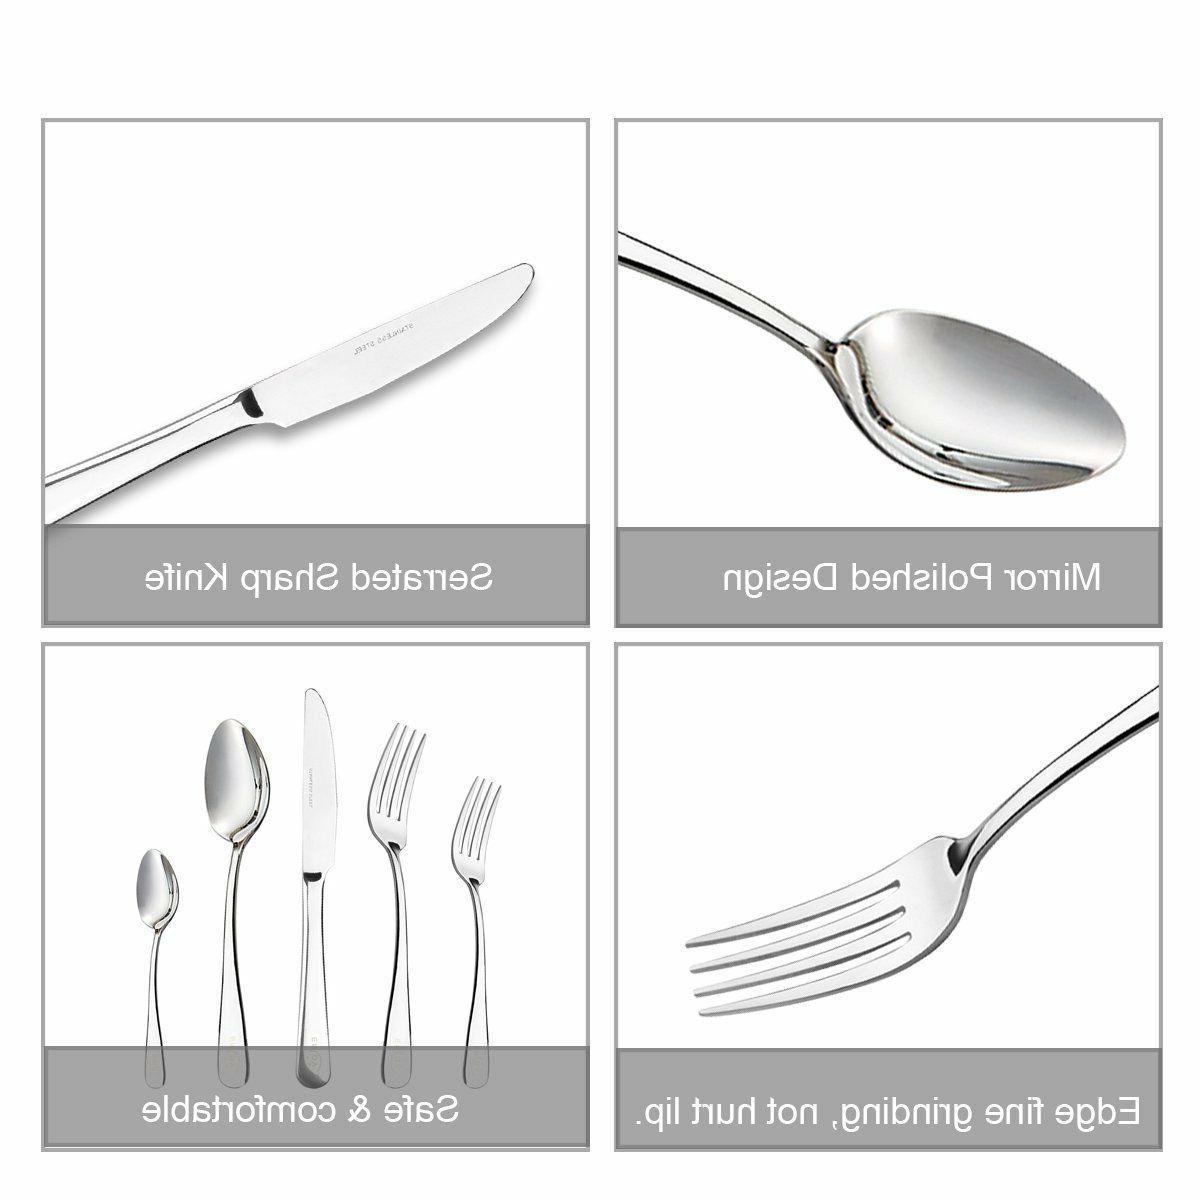 20 Piece Flatware Silverware Cutlery Stainless Steel Service for